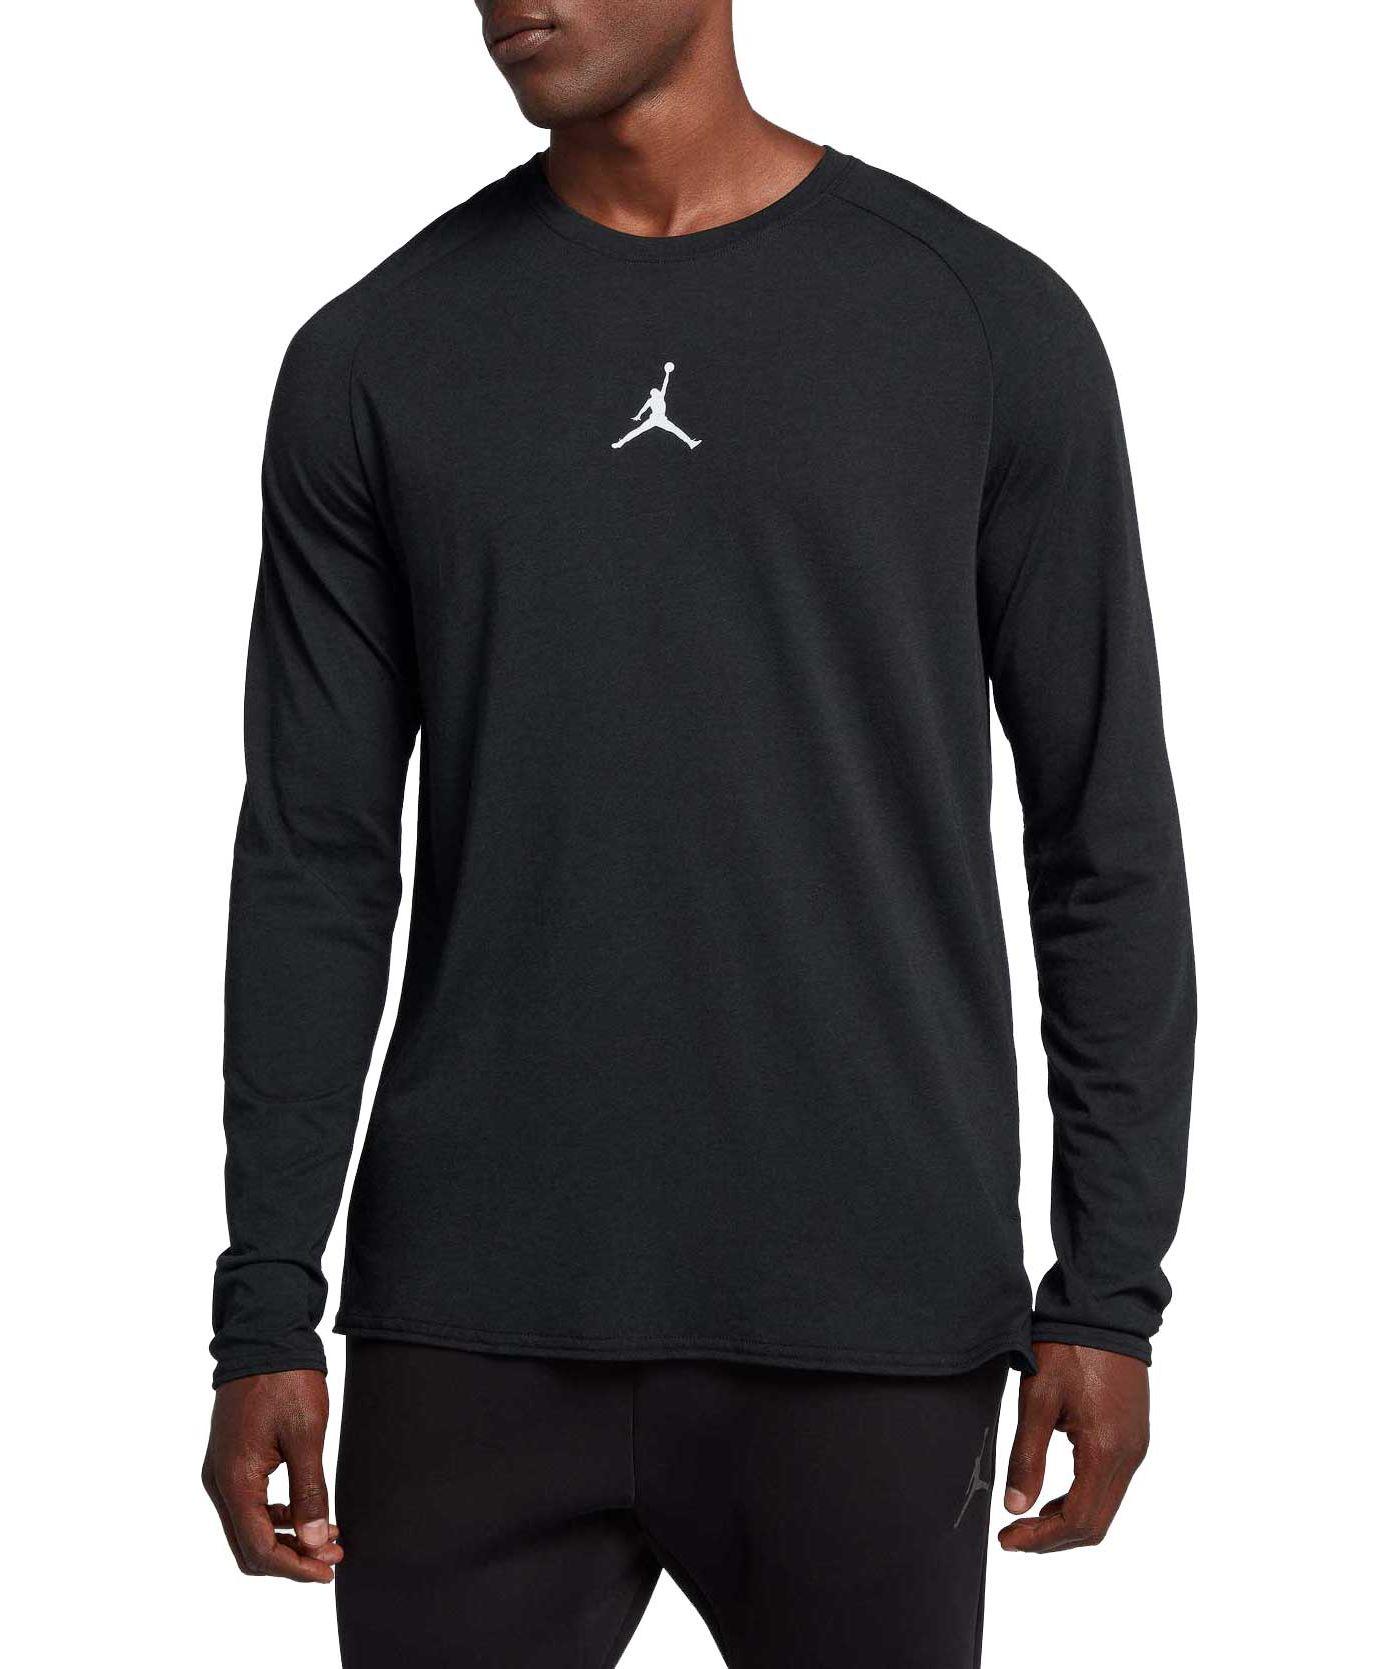 Jordan Men's Dry 23 Alpha Long Sleeve Shirt